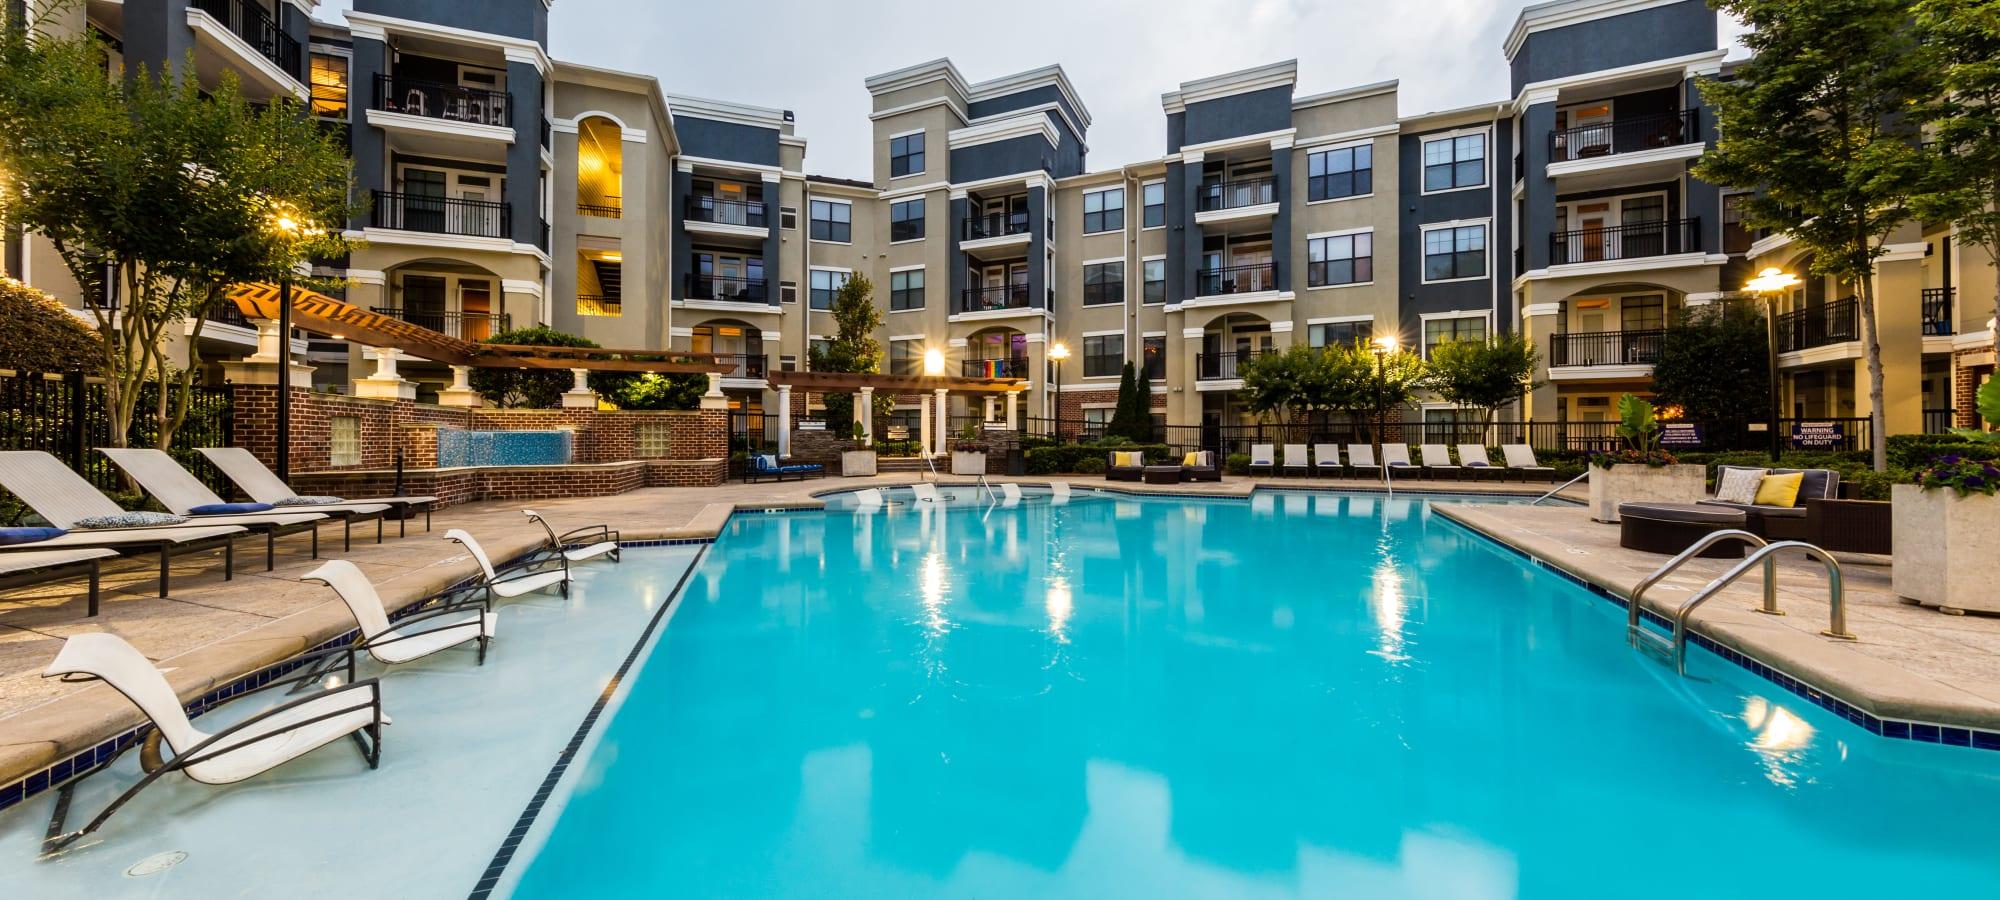 Apartments at Marquis Midtown District in Atlanta, Georgia